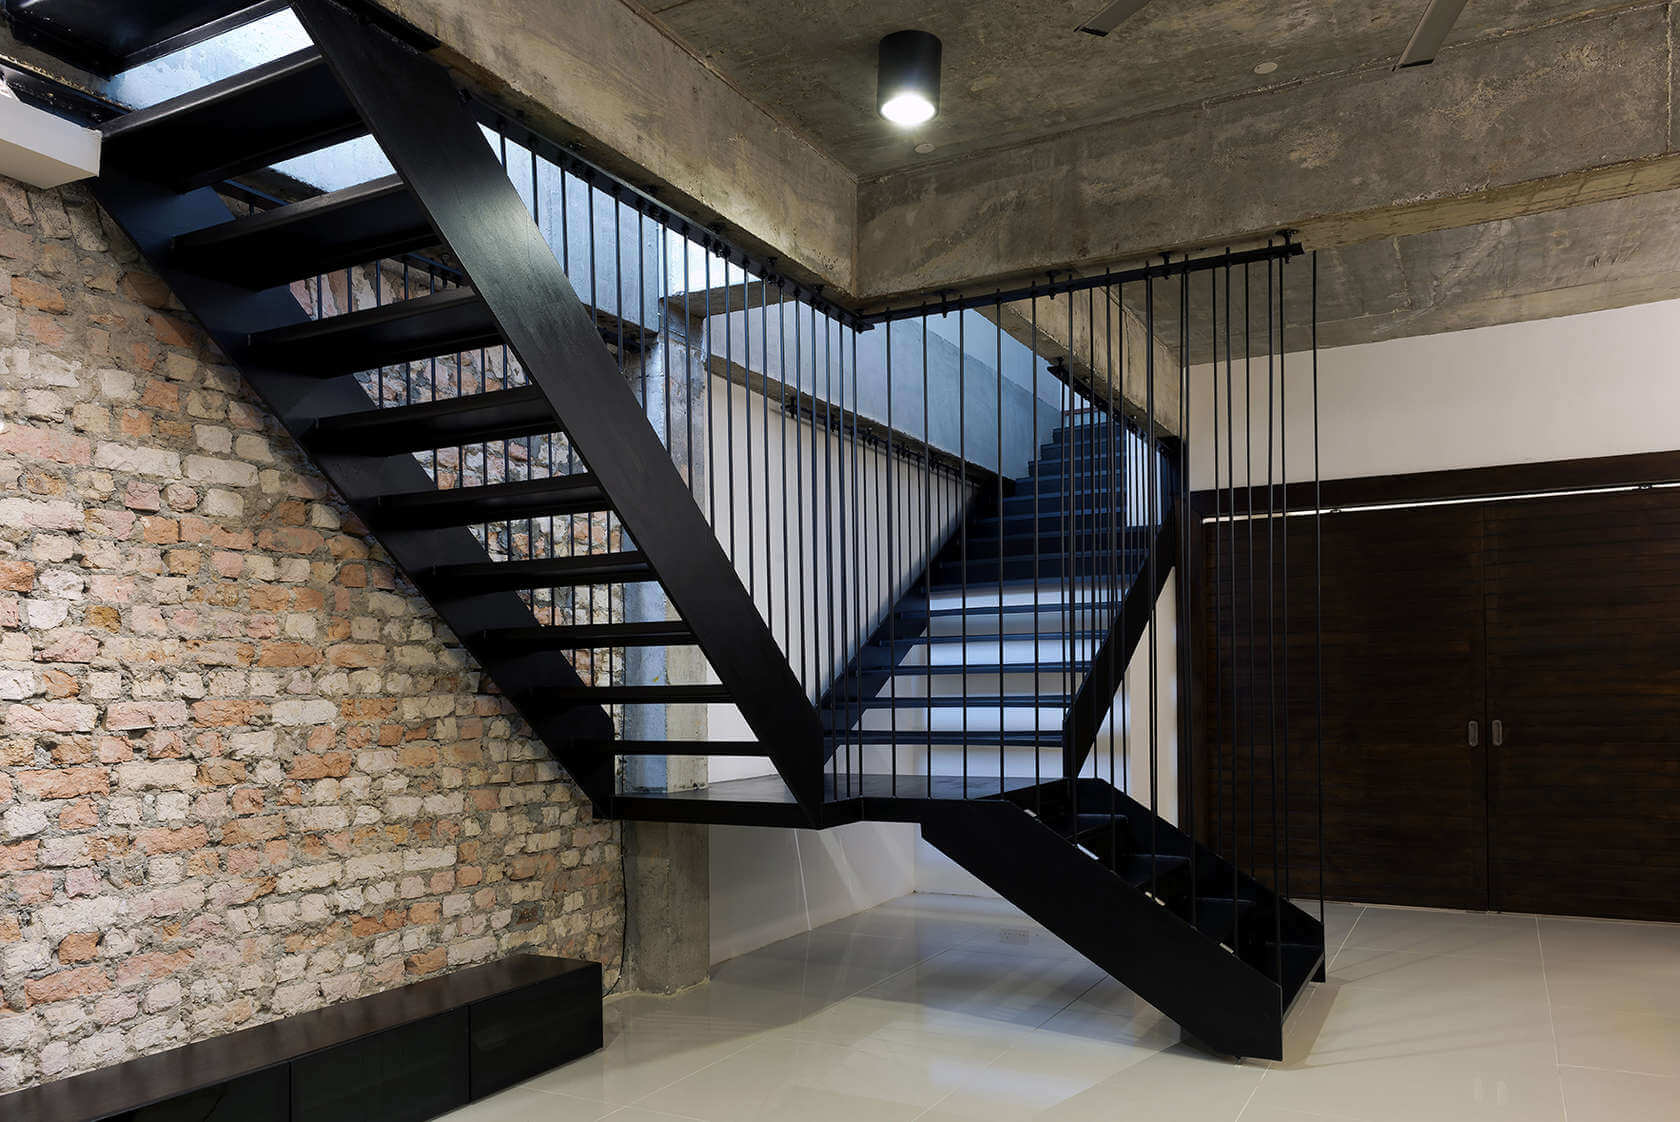 kuala-lumpur-home-drtan-lm-architect-08